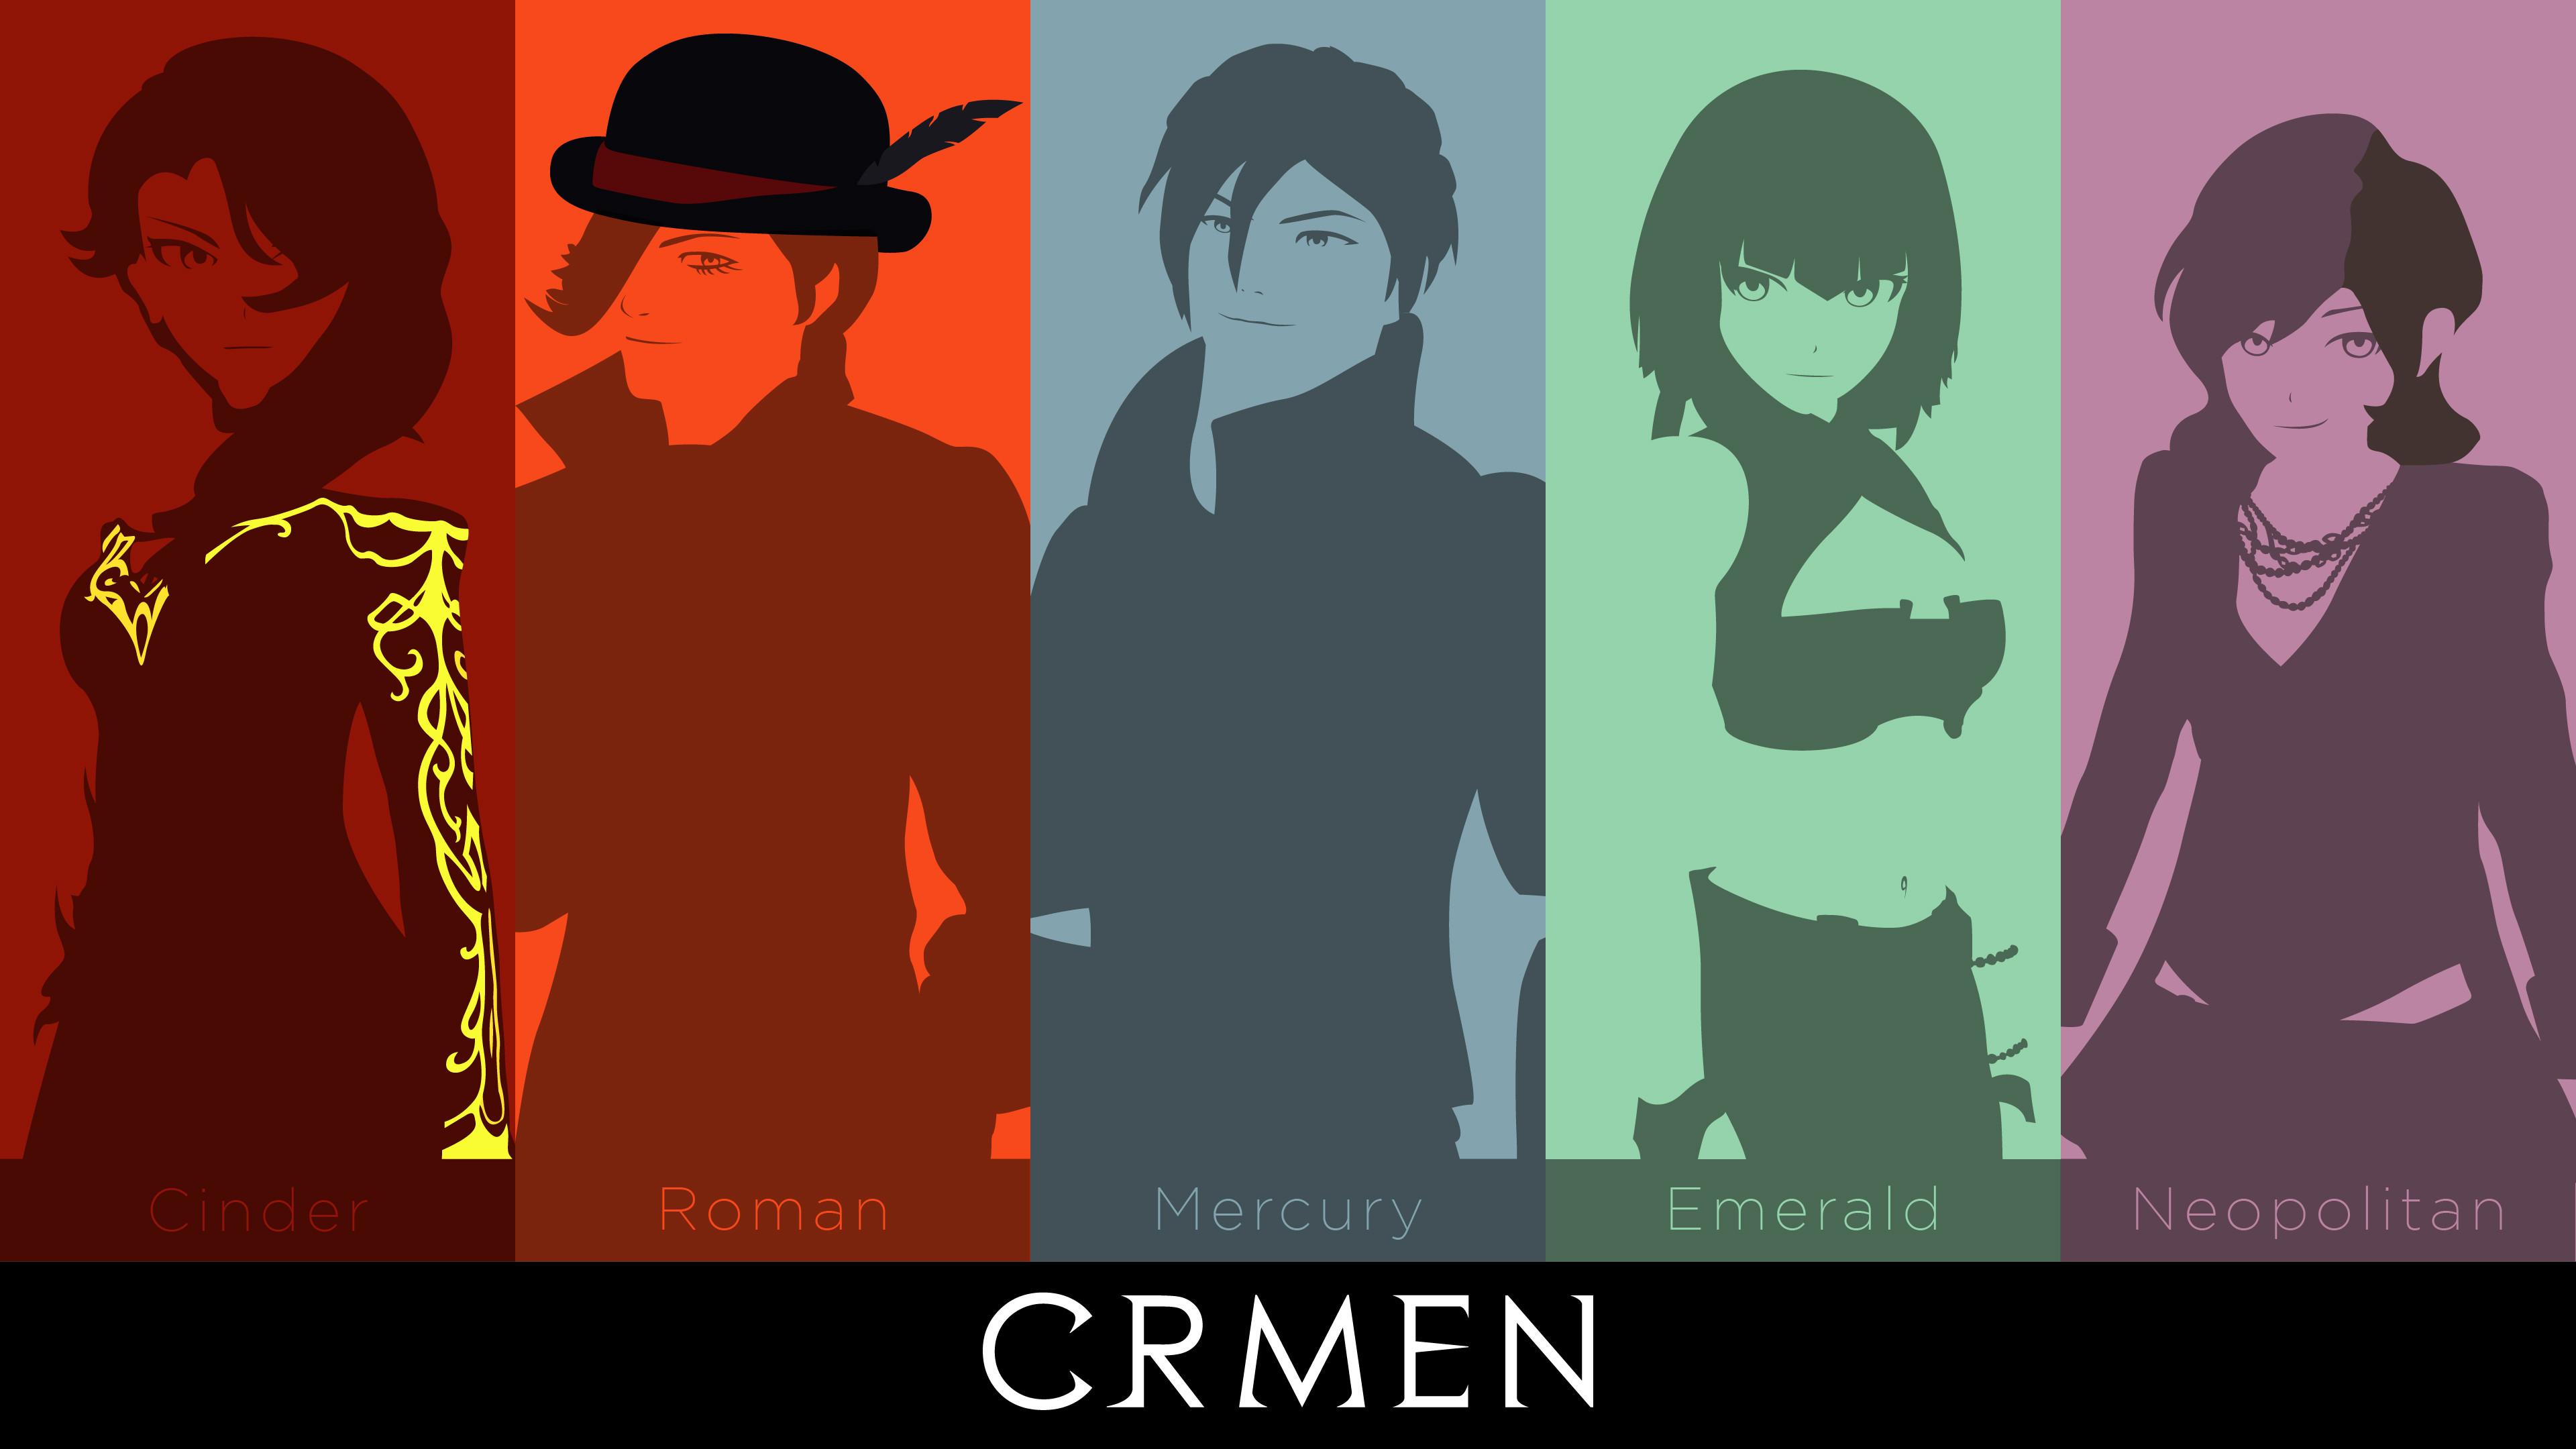 CRMEN (Our Favourite Antagonists) Wallpaper by  DanTherrien101.deviantart.com on @DeviantArt